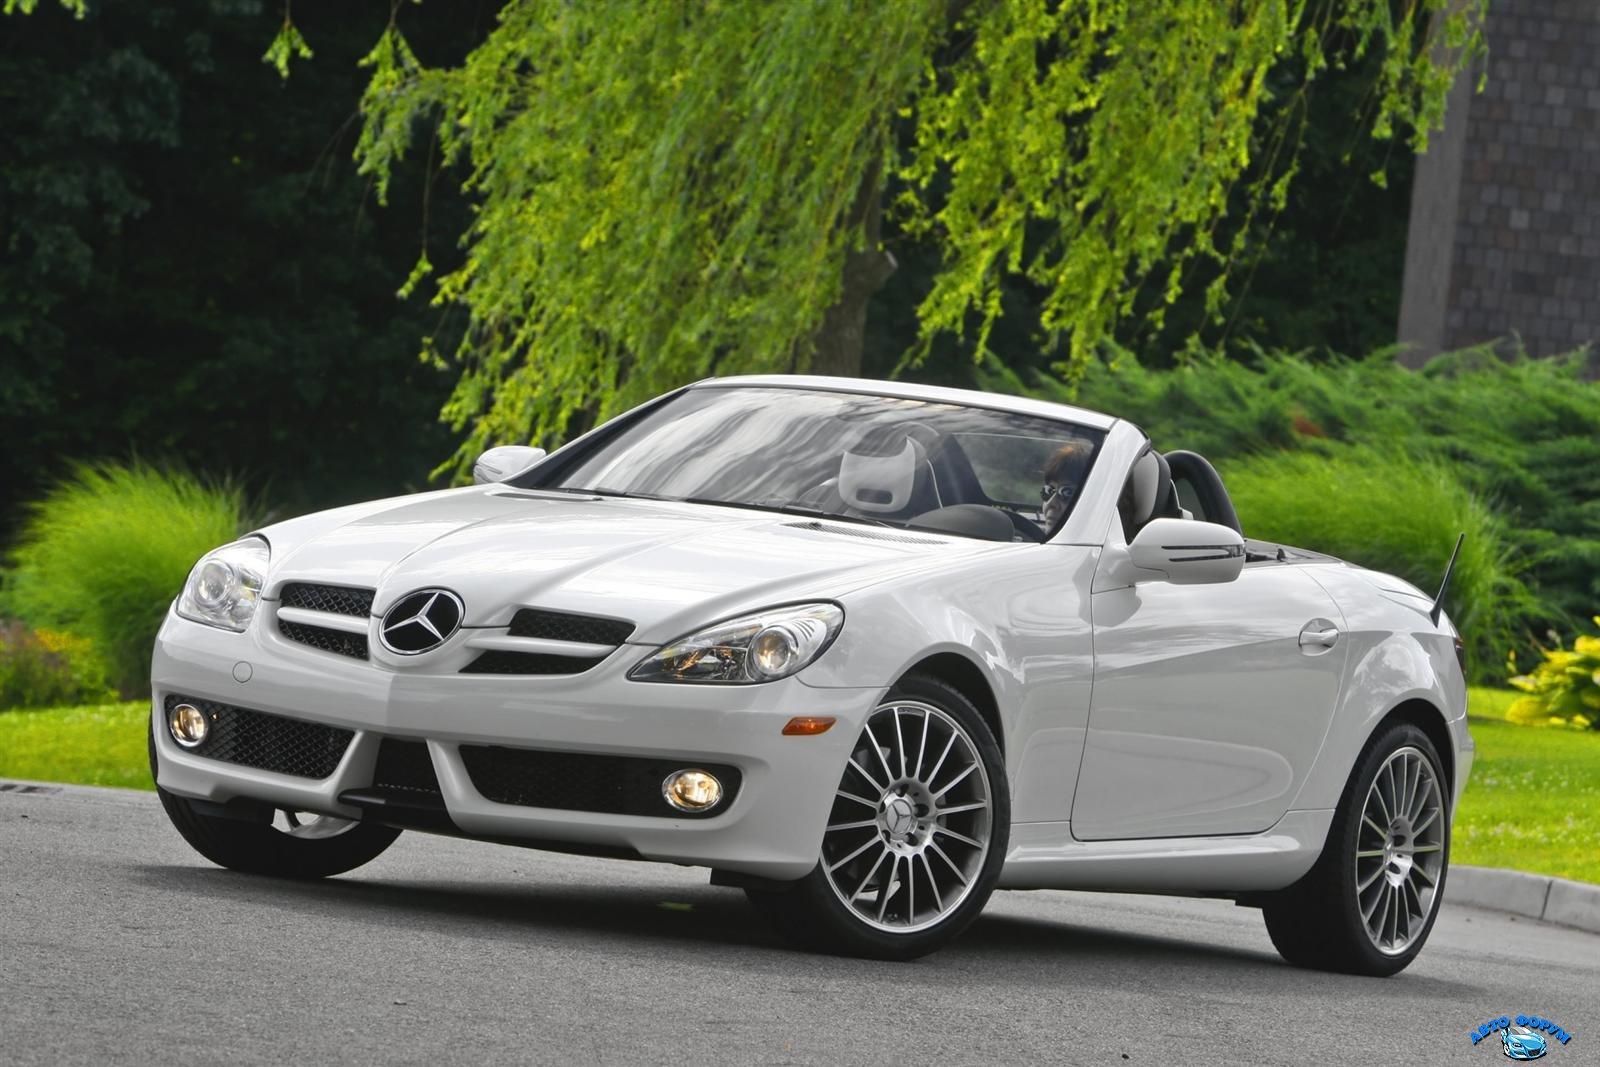 2010-Mercedes-Benz-SLK-Class-Image-085-1600.jpg